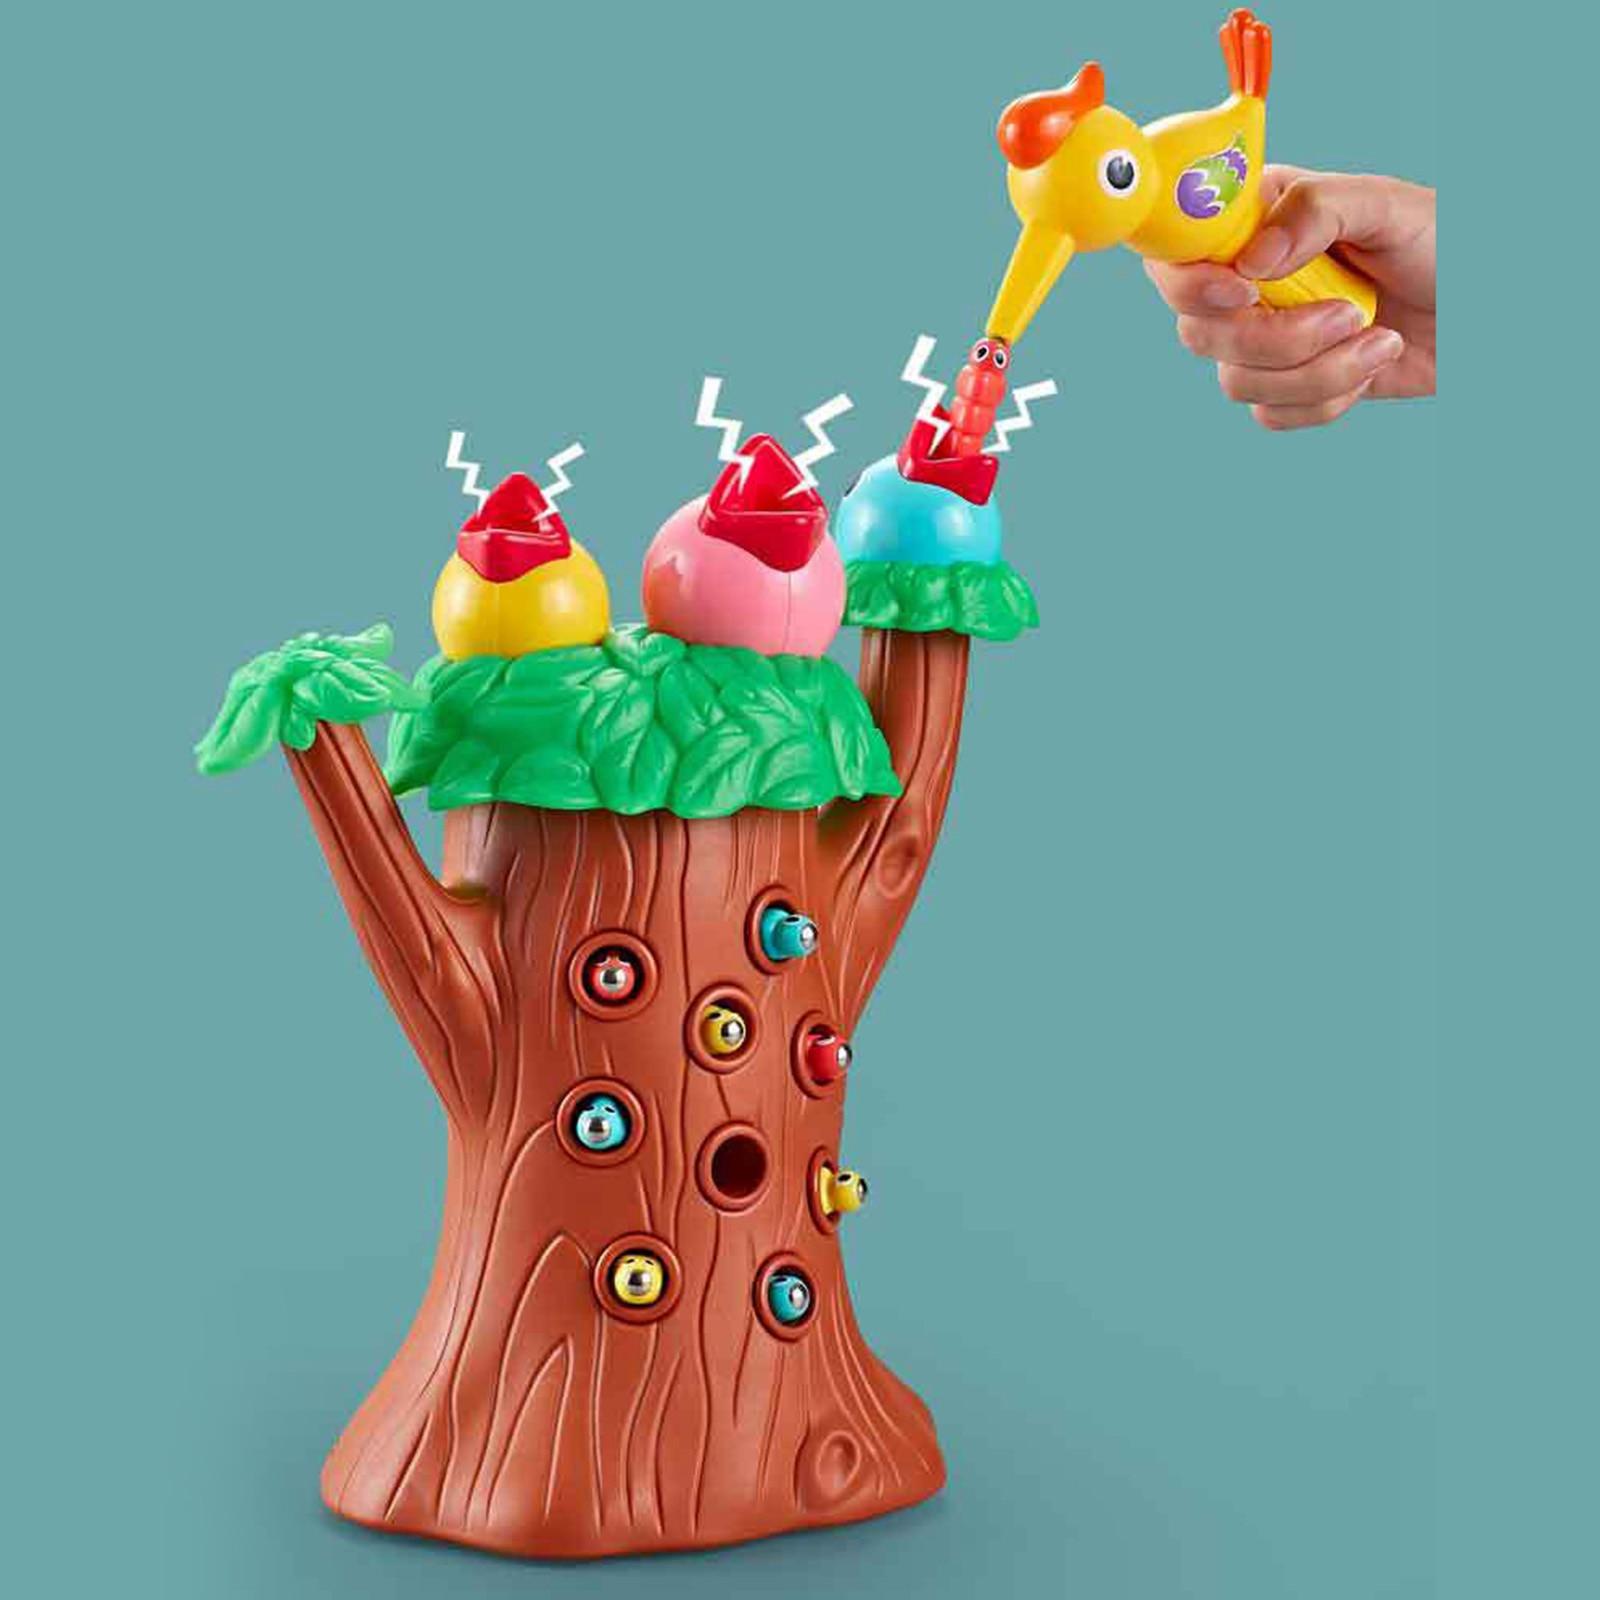 Kids Magnetic Woodpecker Toy for Age 3+ Girls Boys Role Play Sensory Feeding Preschool Games